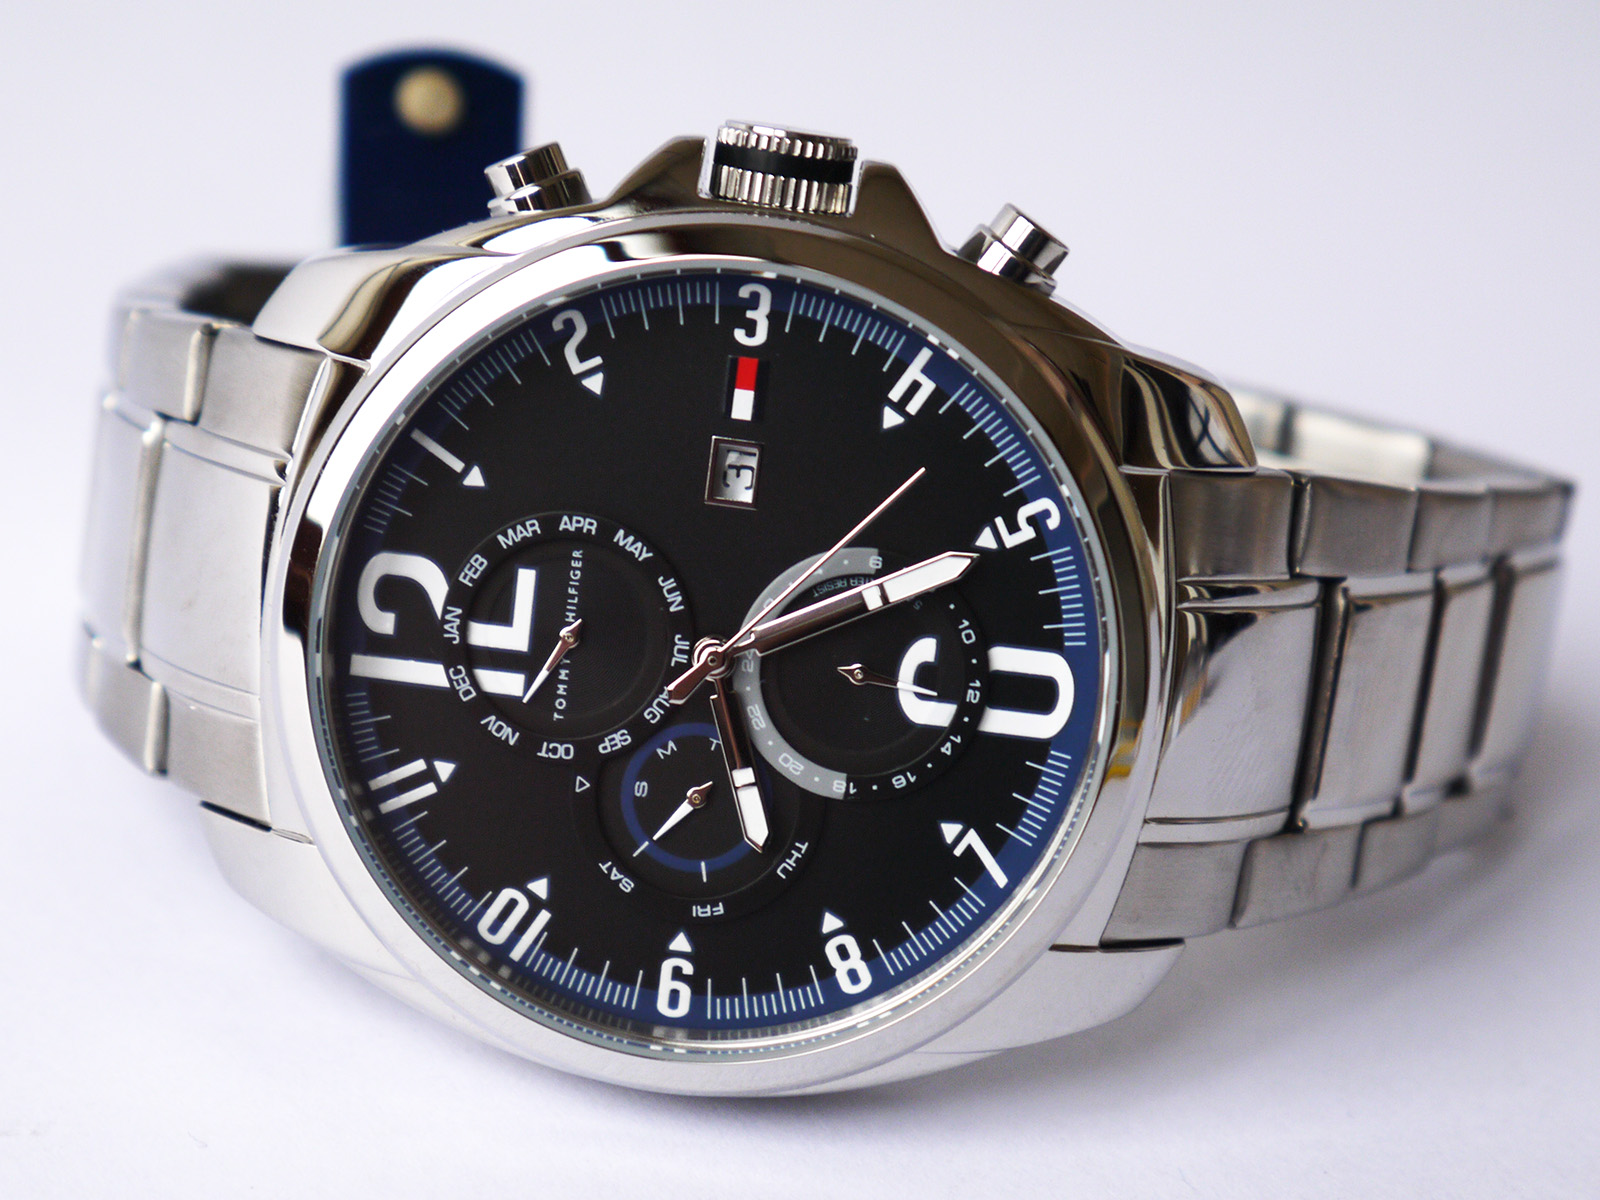 tommy hilfiger 1790831 sport watch high quality watch. Black Bedroom Furniture Sets. Home Design Ideas